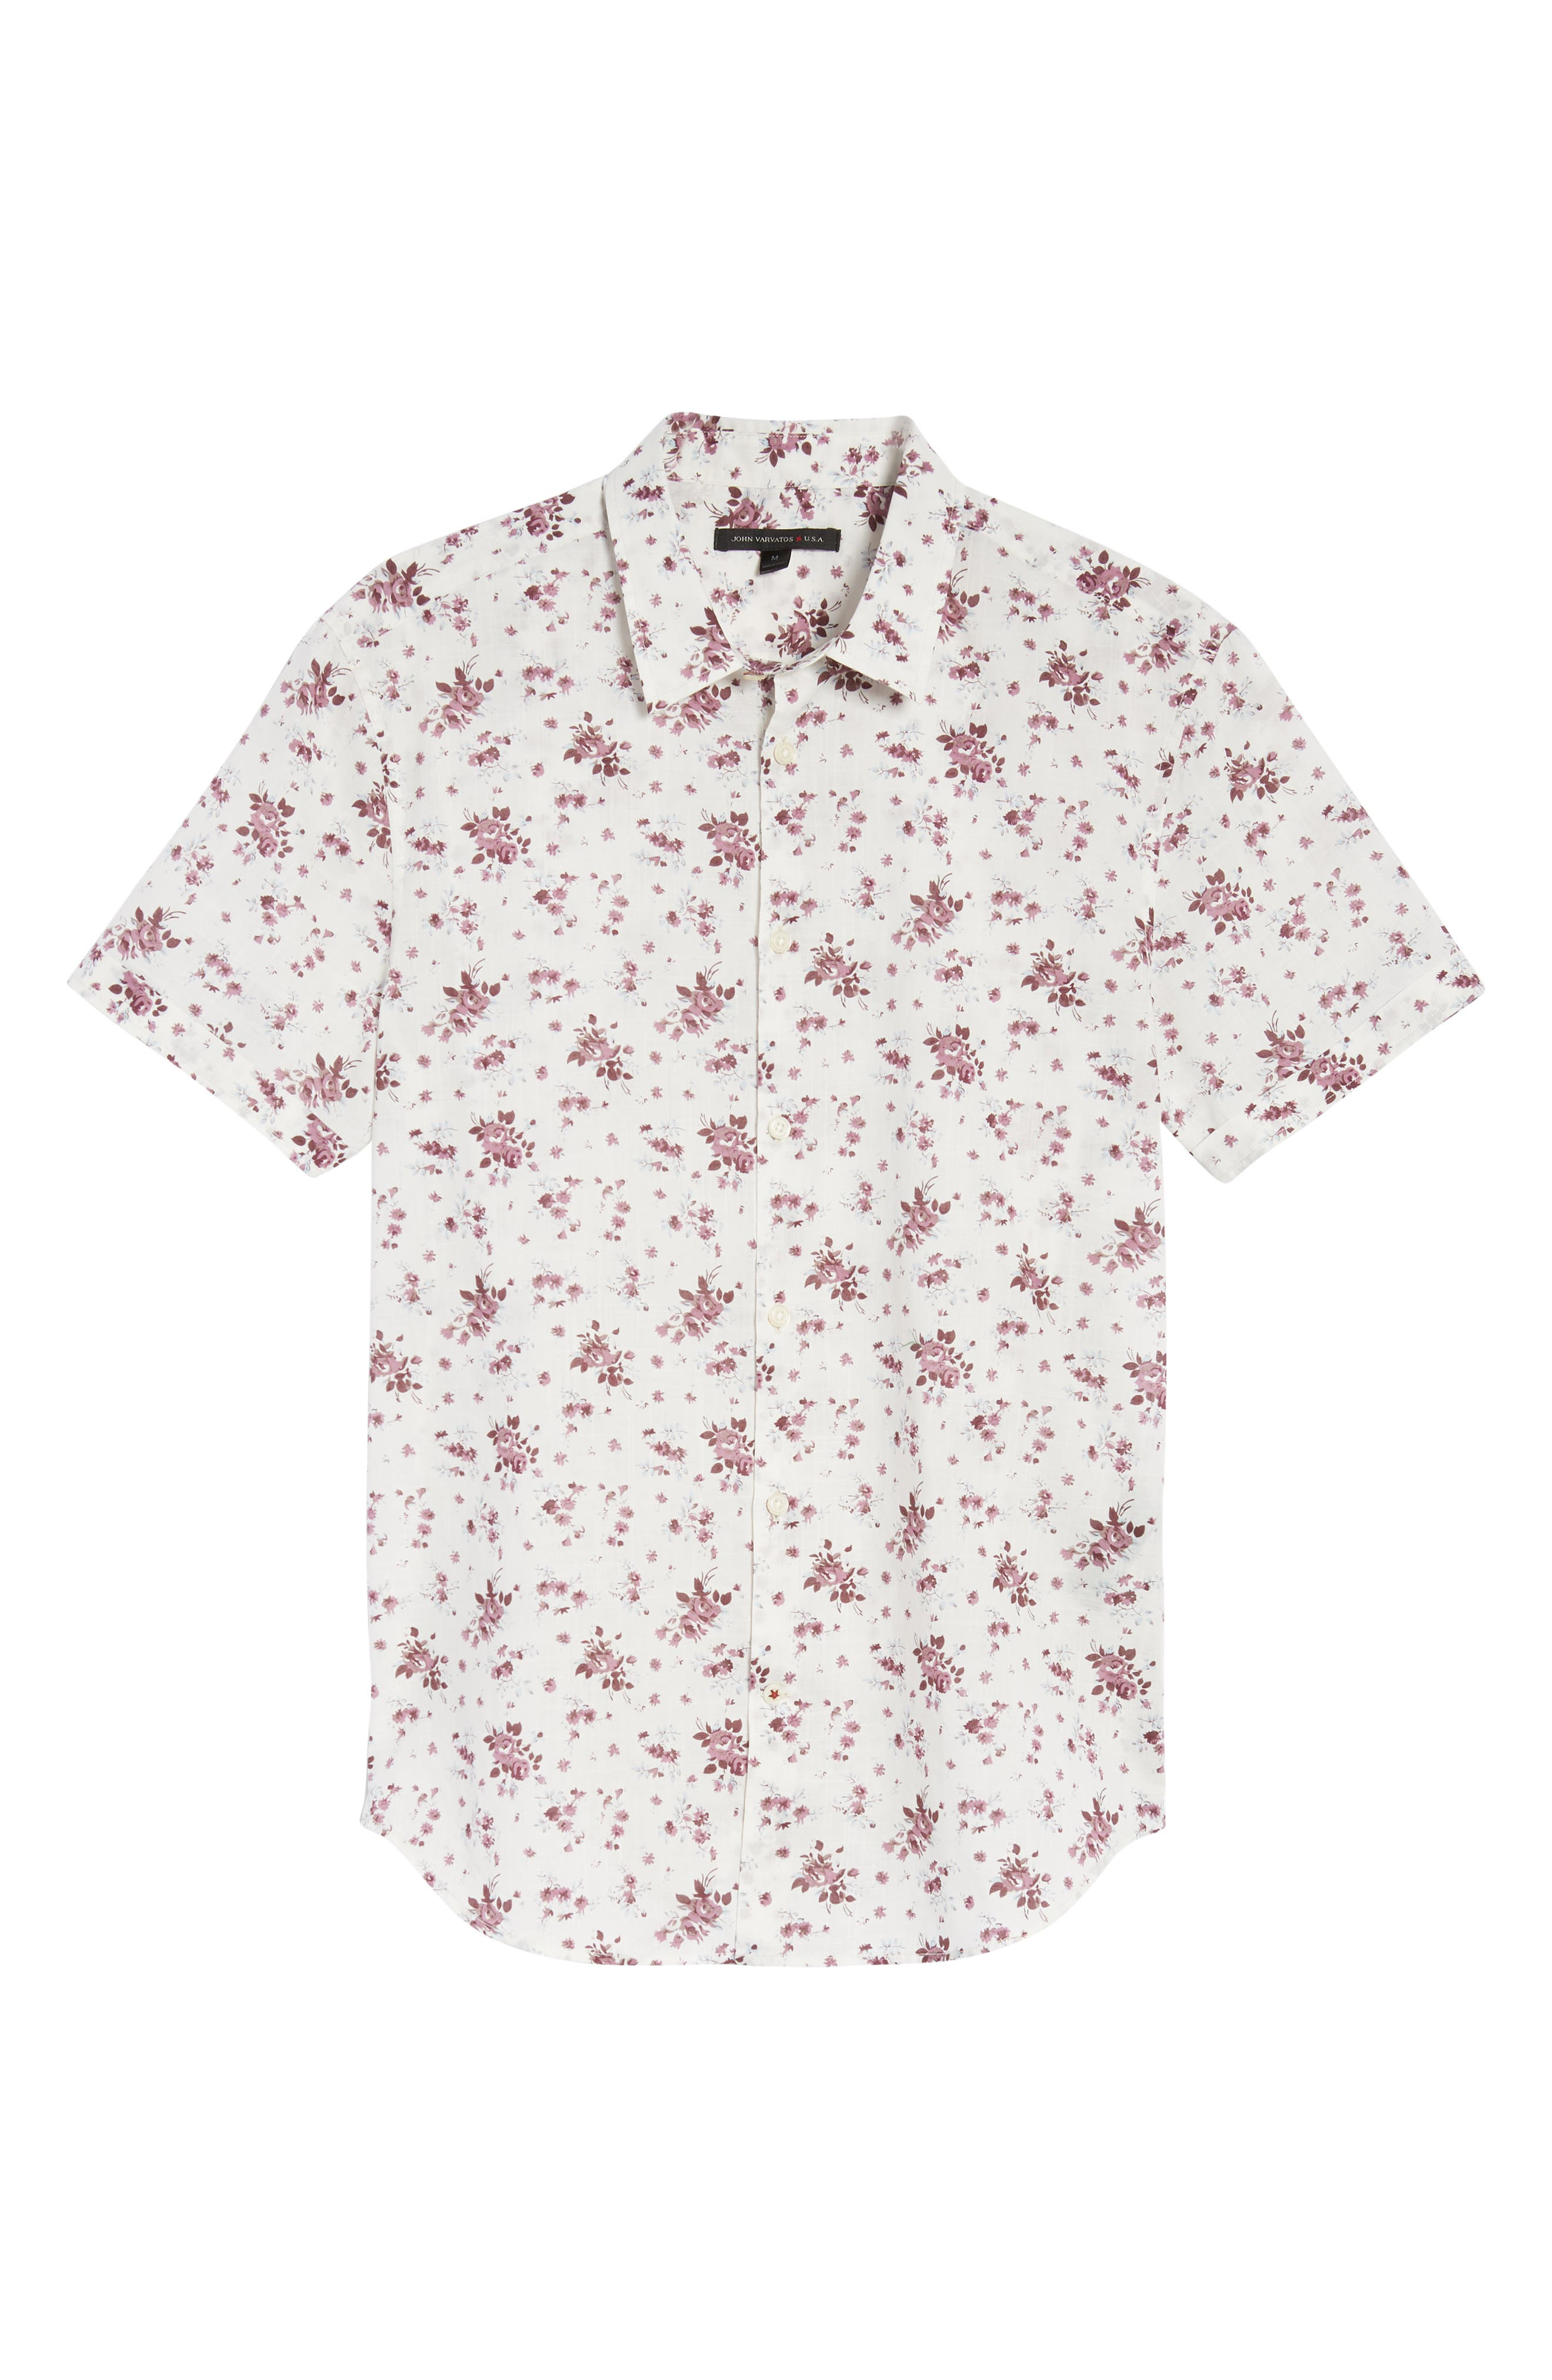 Regular Fit Floral Woven Shirt,                             Alternate thumbnail 6, color,                             ANTIQUE ROSE